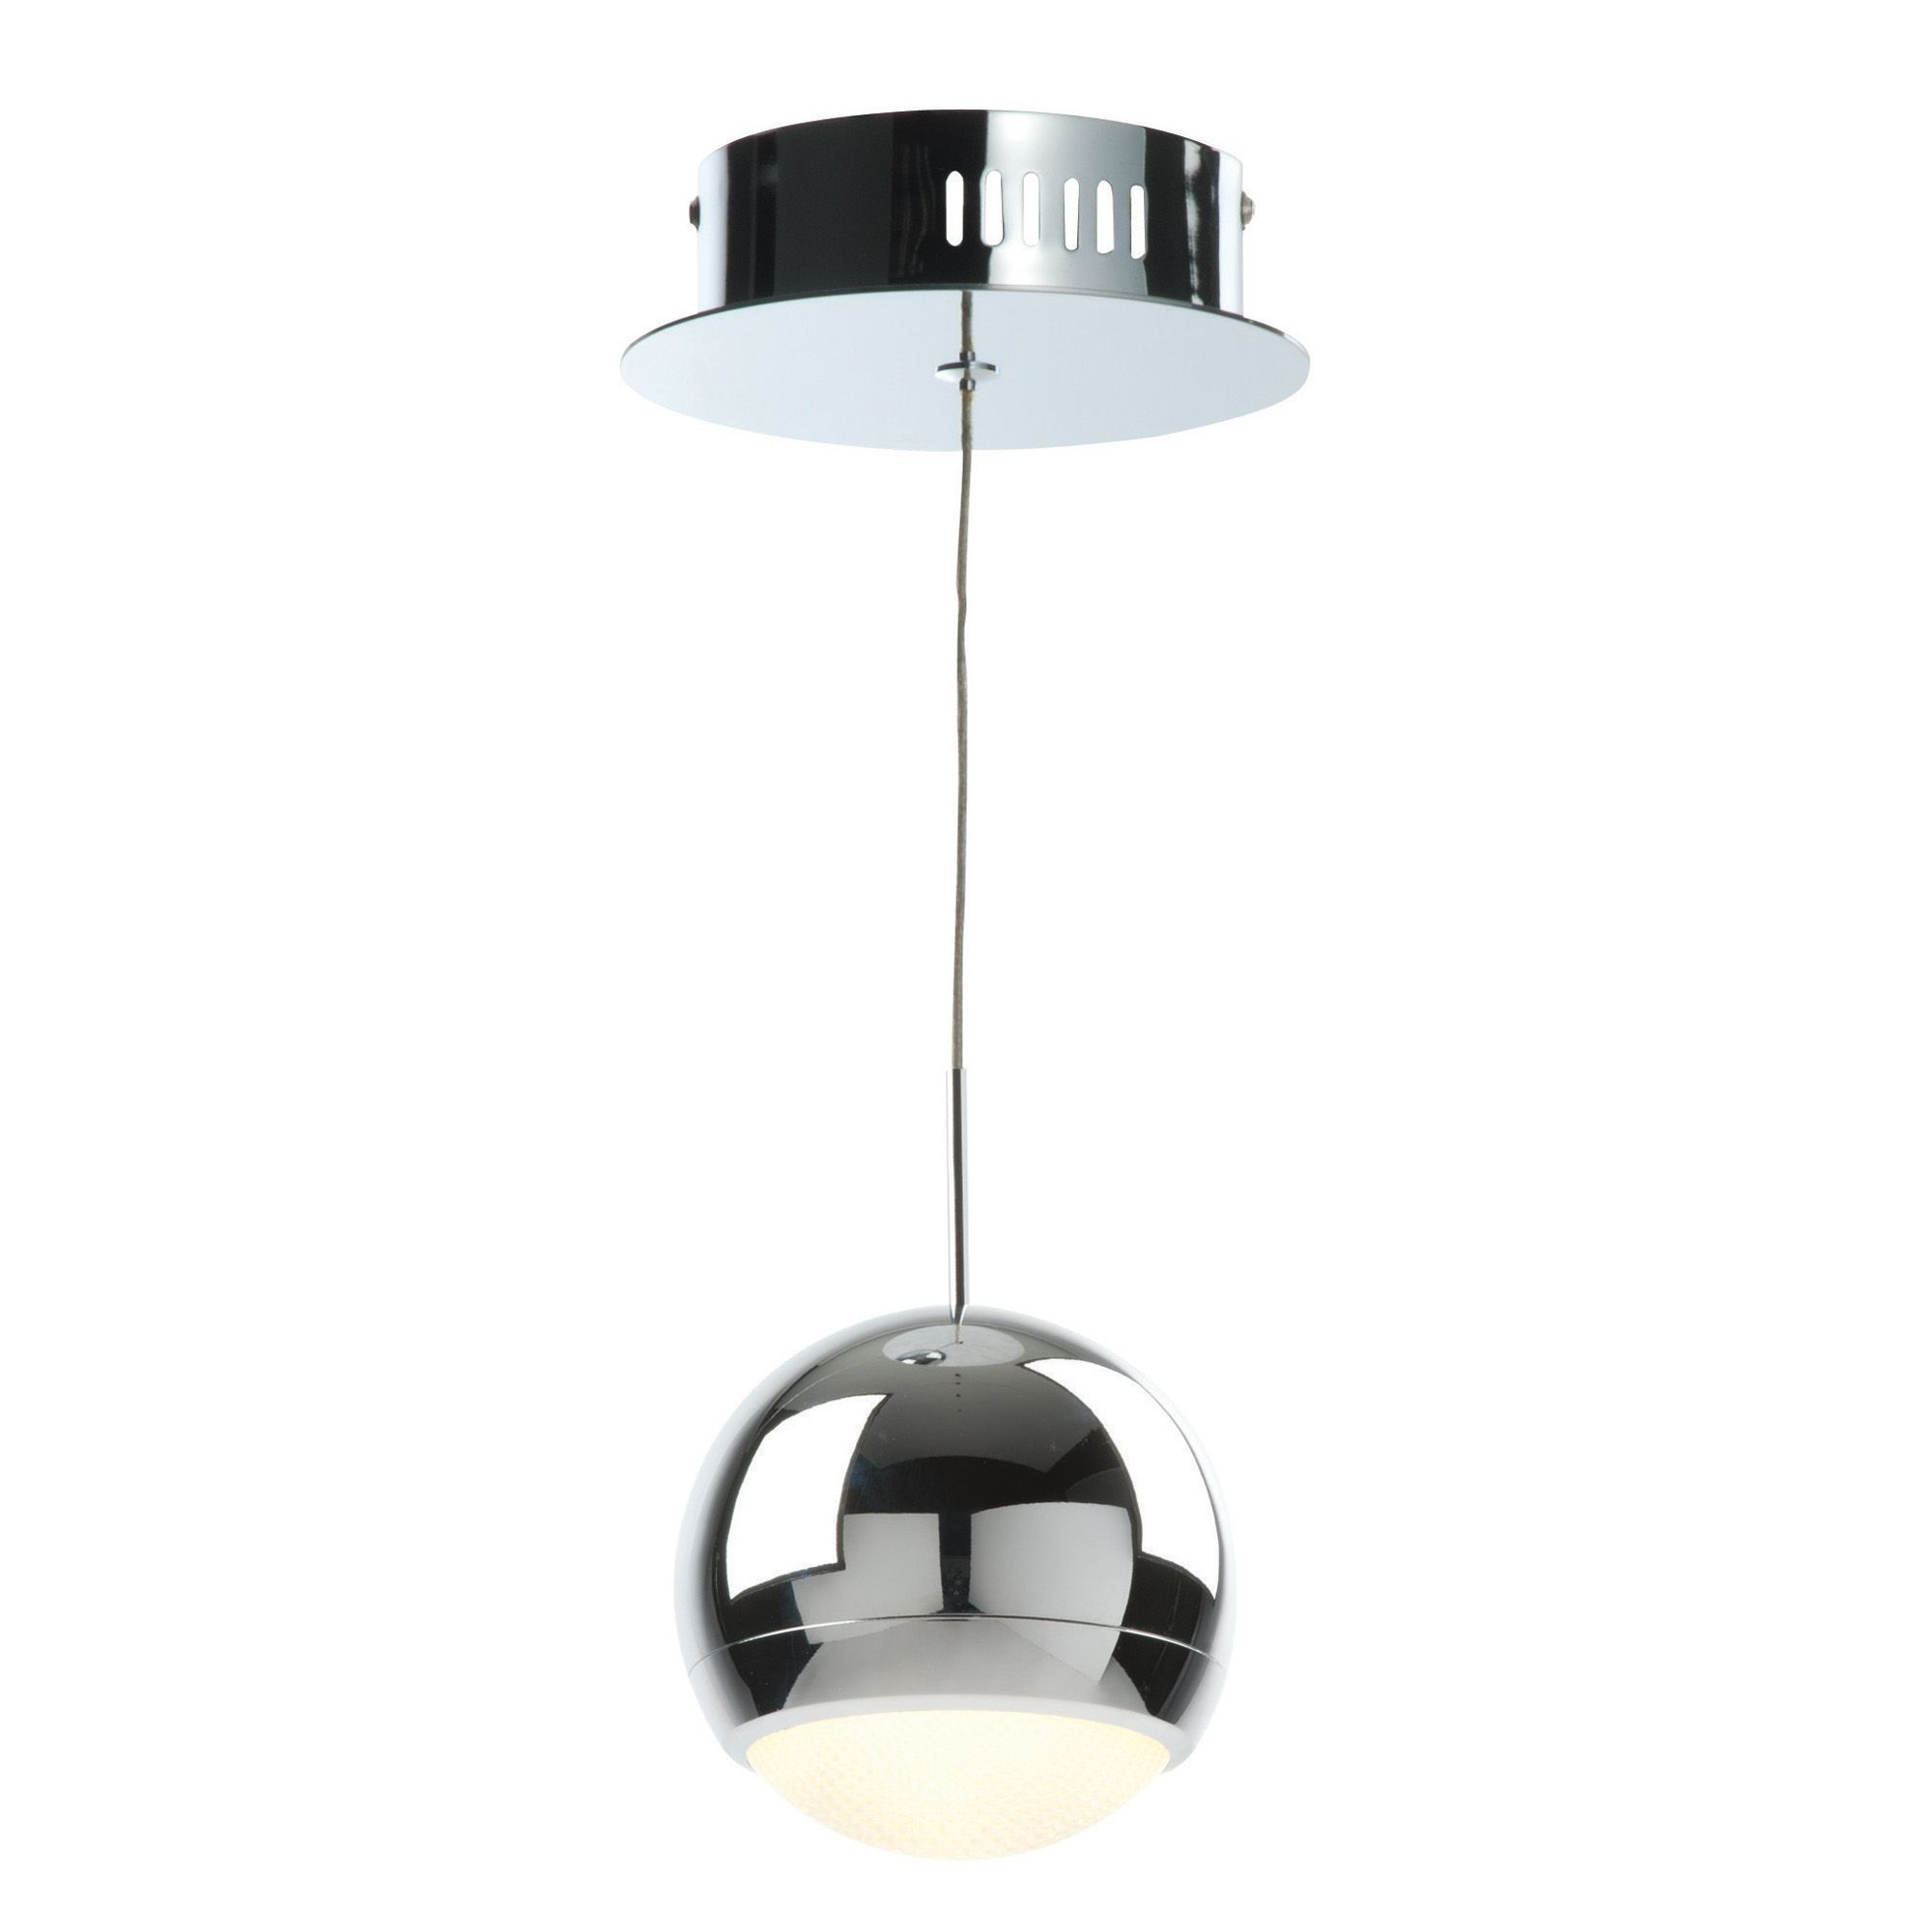 Pluto chrome effect pendant ceiling light departments diy at bq aloadofball Choice Image